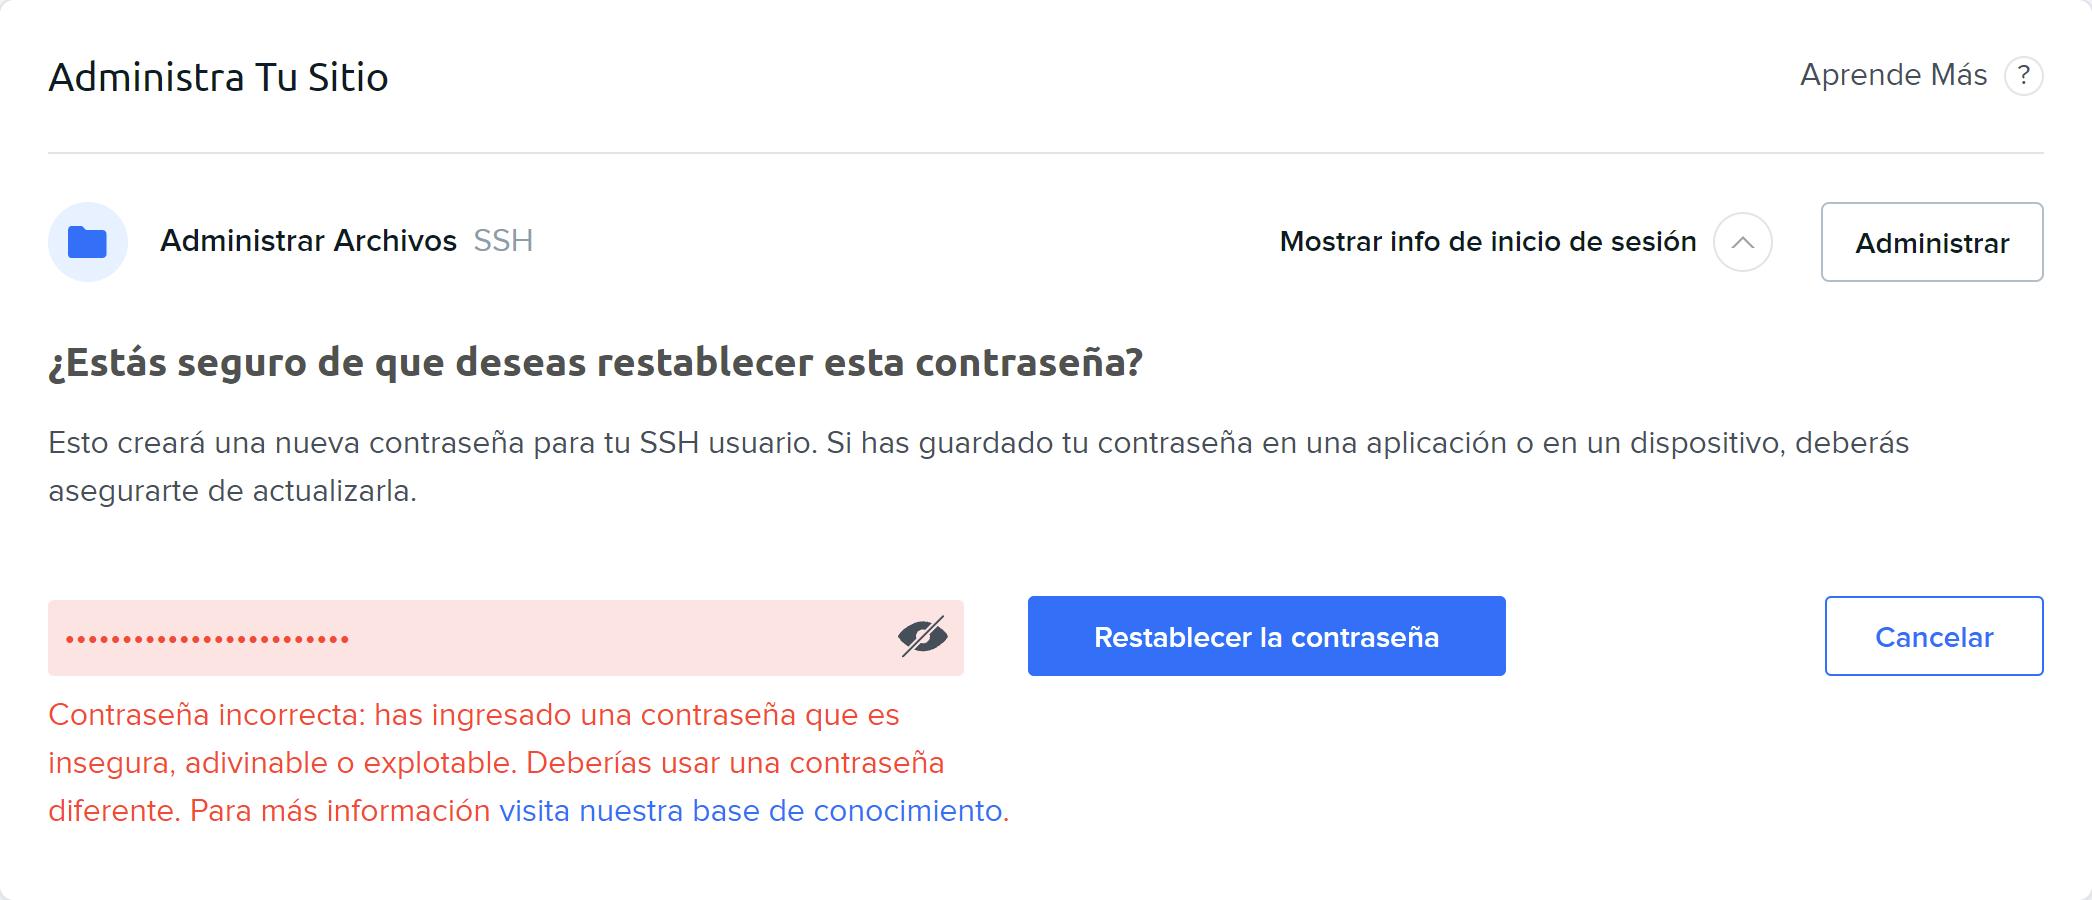 Compromised Password Error